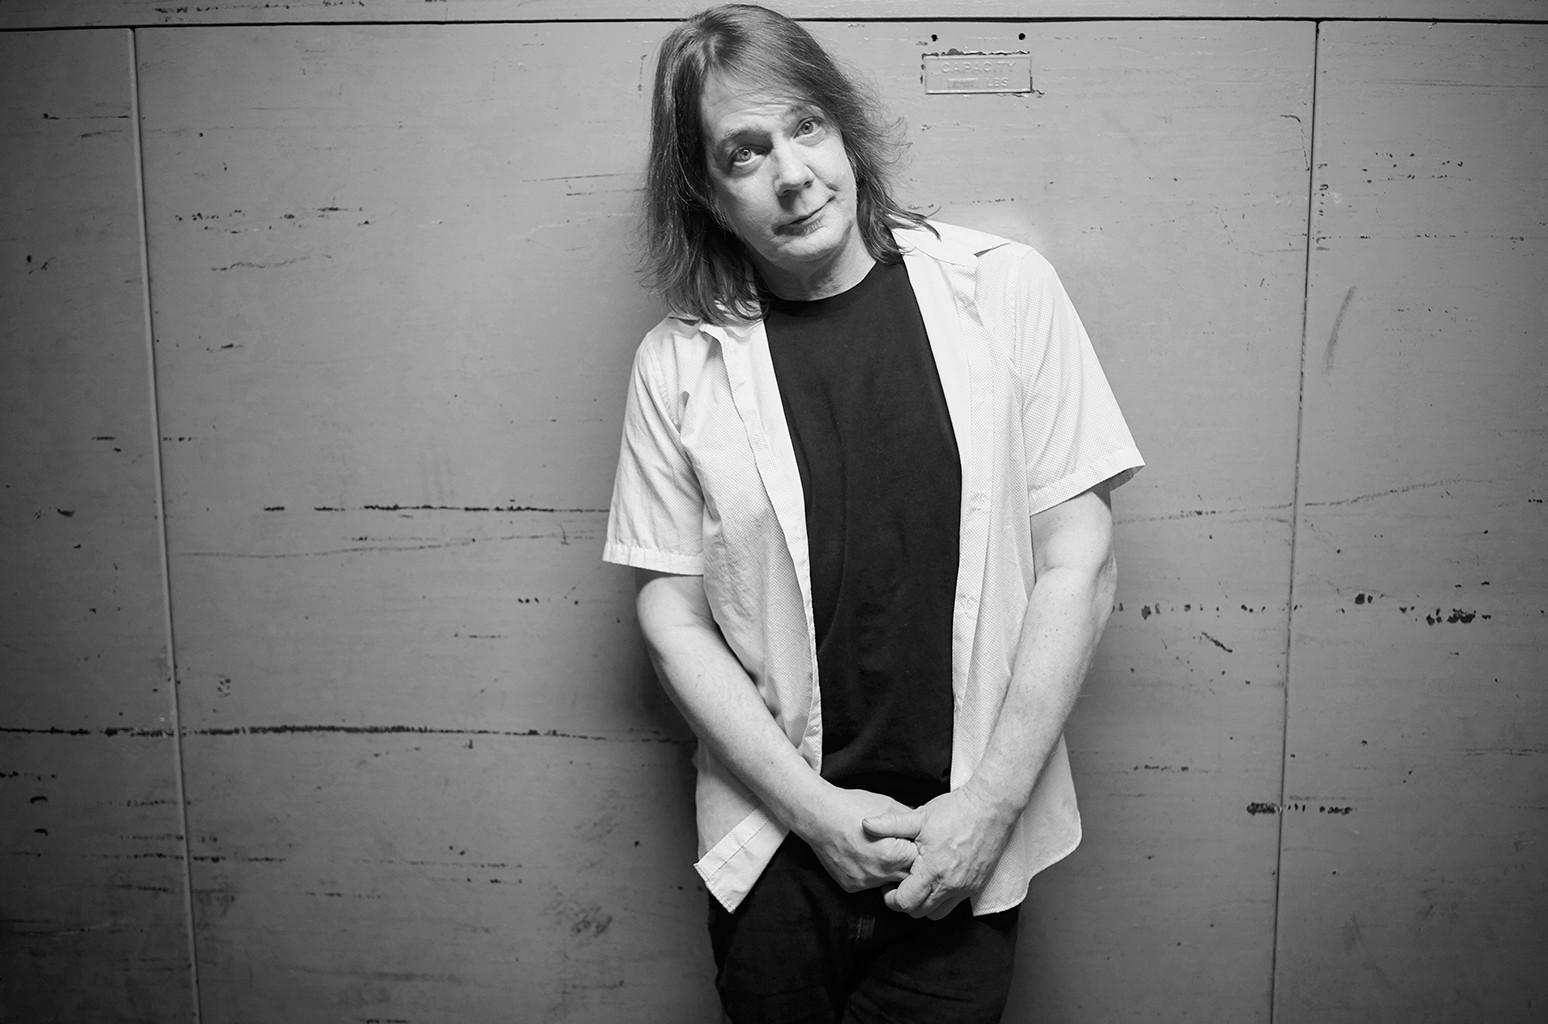 Dave Pirner, Soul Asylum